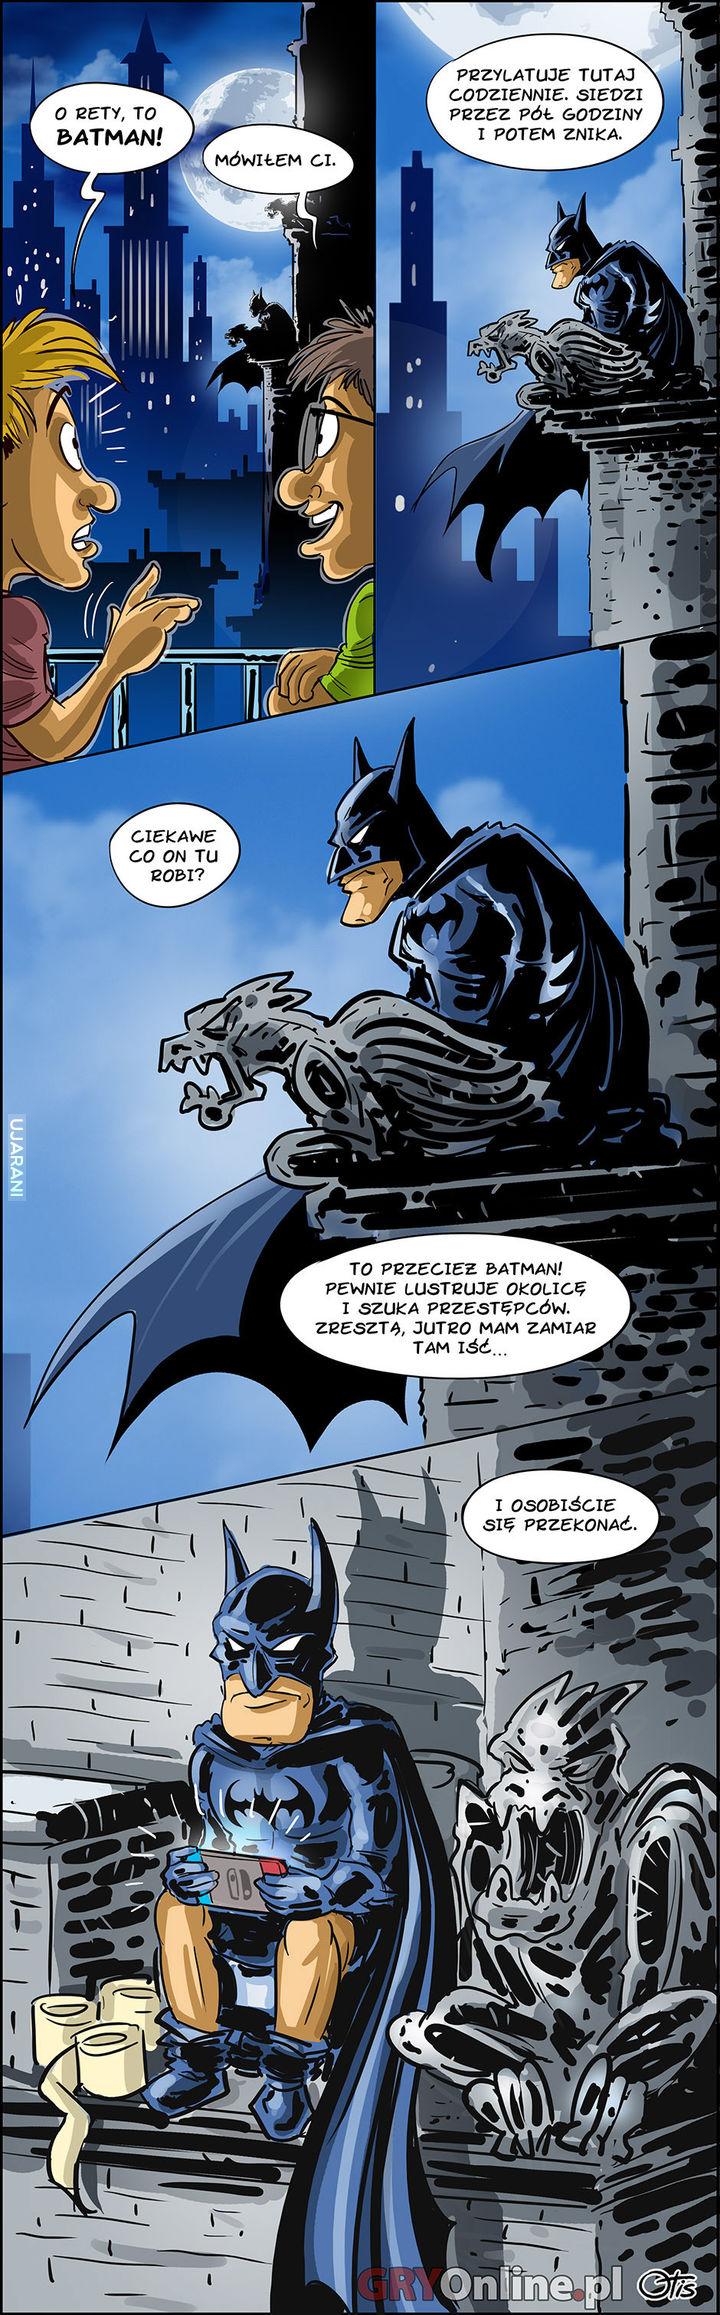 Co robi Batman?